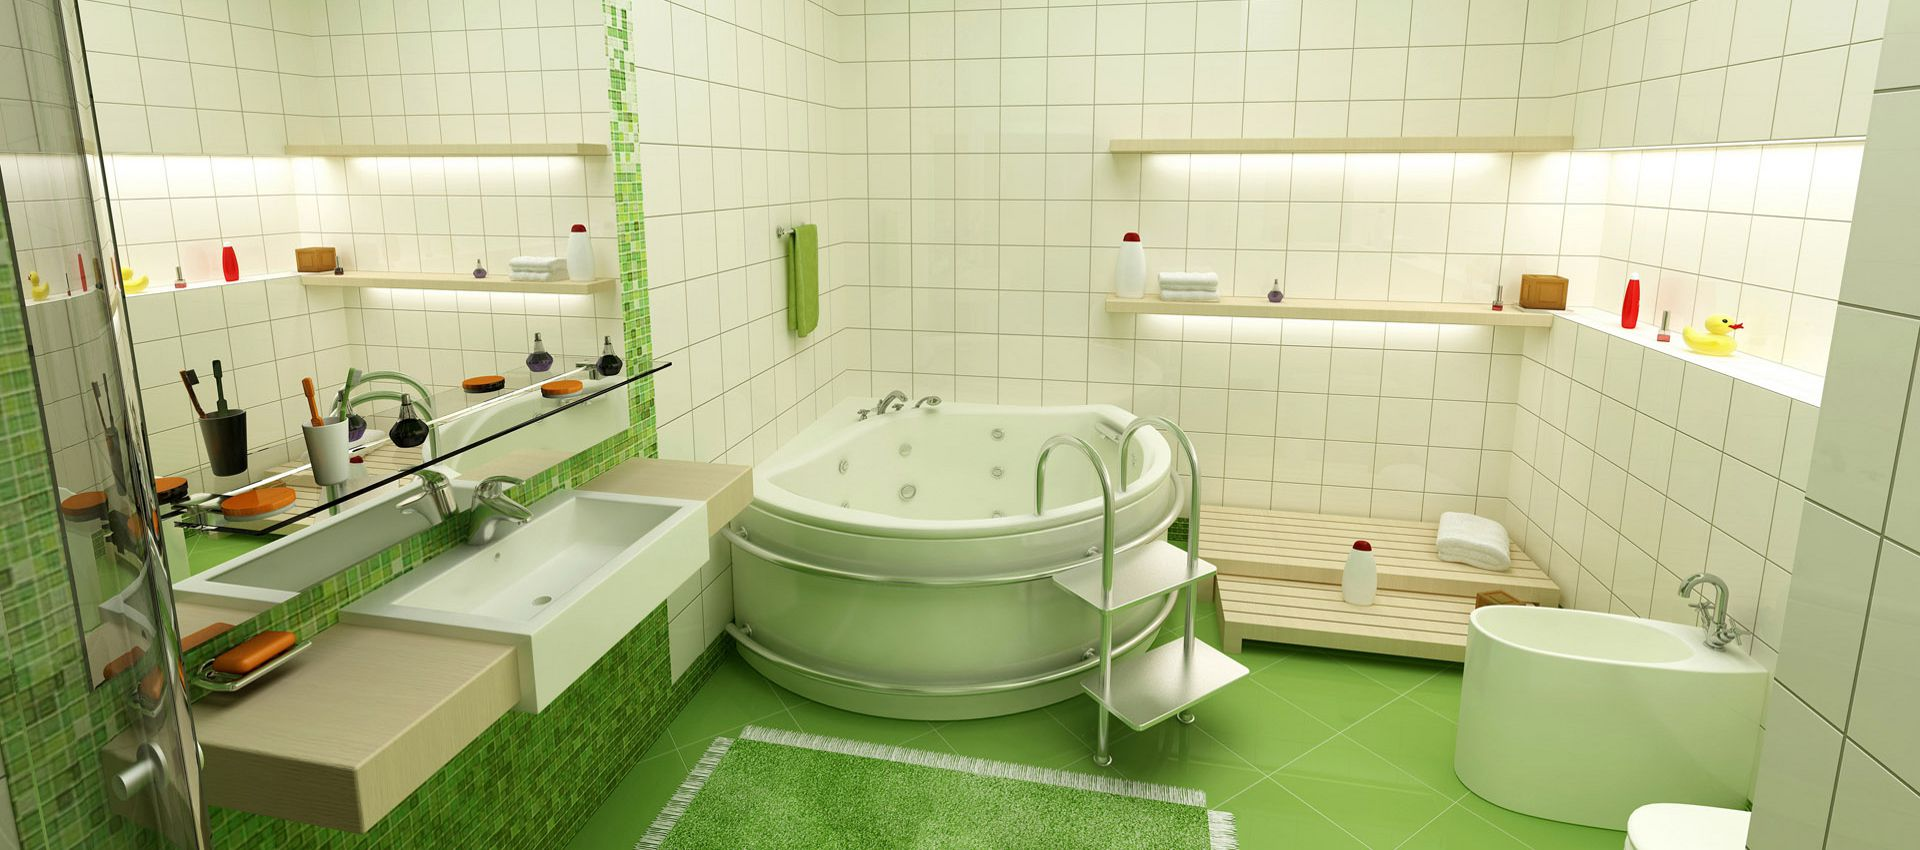 P ytki ceramiczne azienkowe kuchenne bielsko bia a for Brown and green bathroom designs